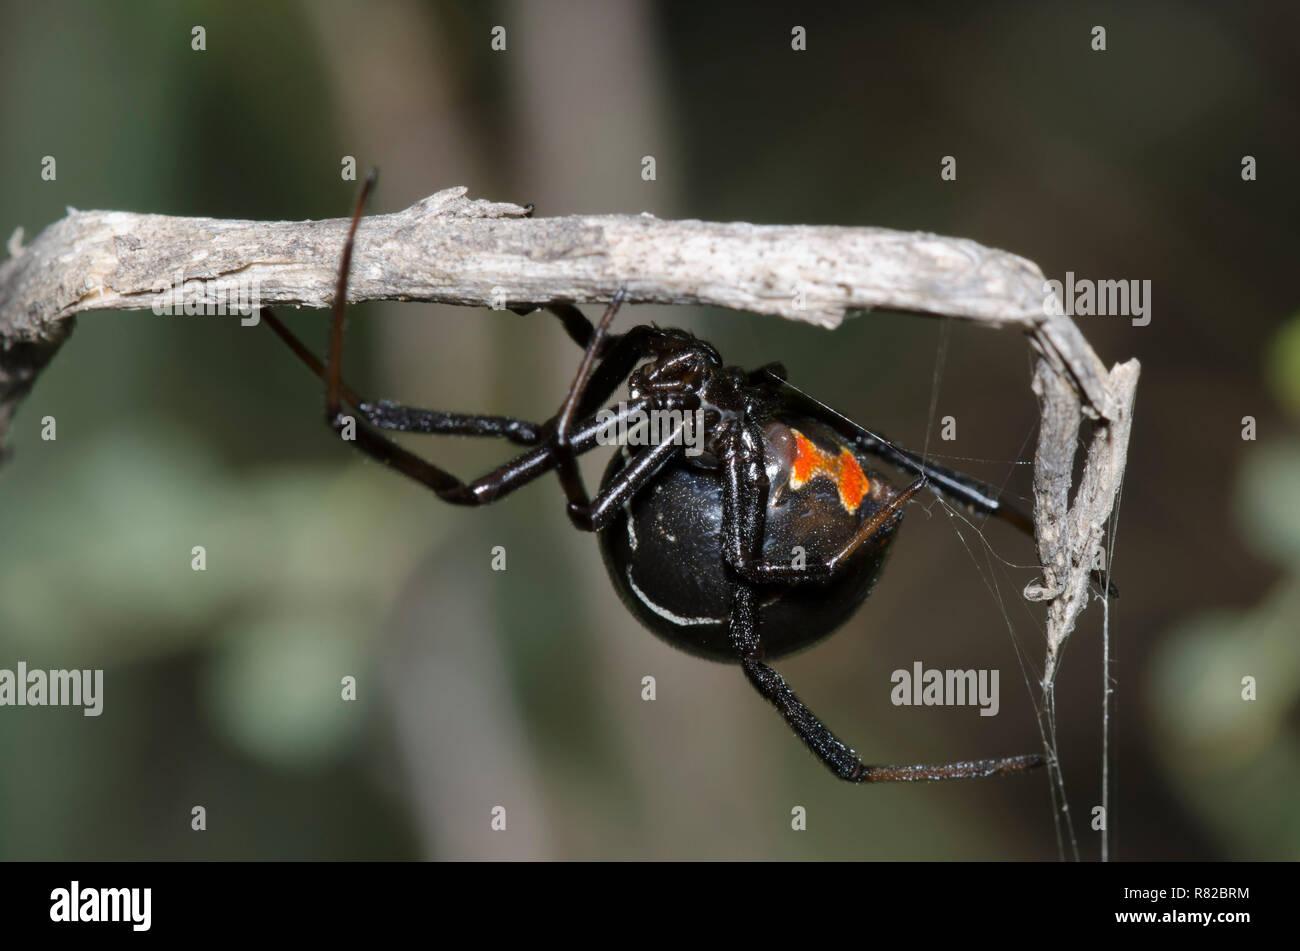 Black Widow, Latrodectus sp. - Stock Image